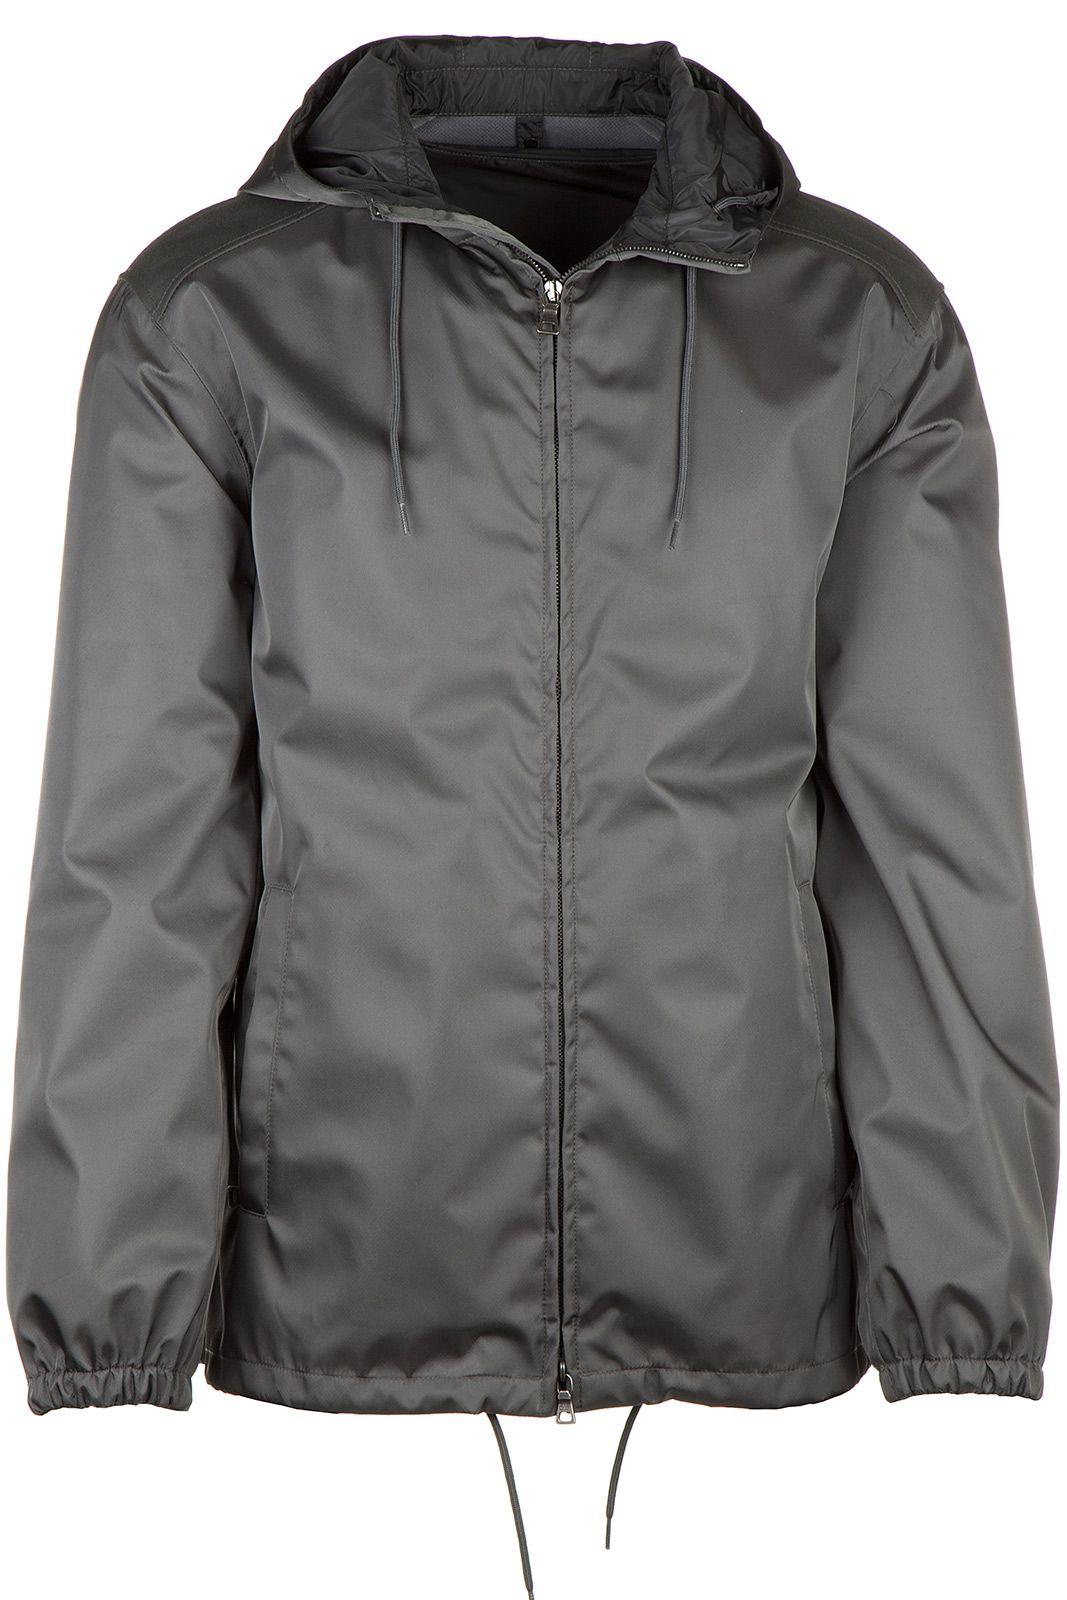 Prada Men S Outerwear Jacket Blouson Hood Gabardine Prada Cloth Mens Outerwear Jacket Outerwear Jackets Prada Men [ 1600 x 1067 Pixel ]